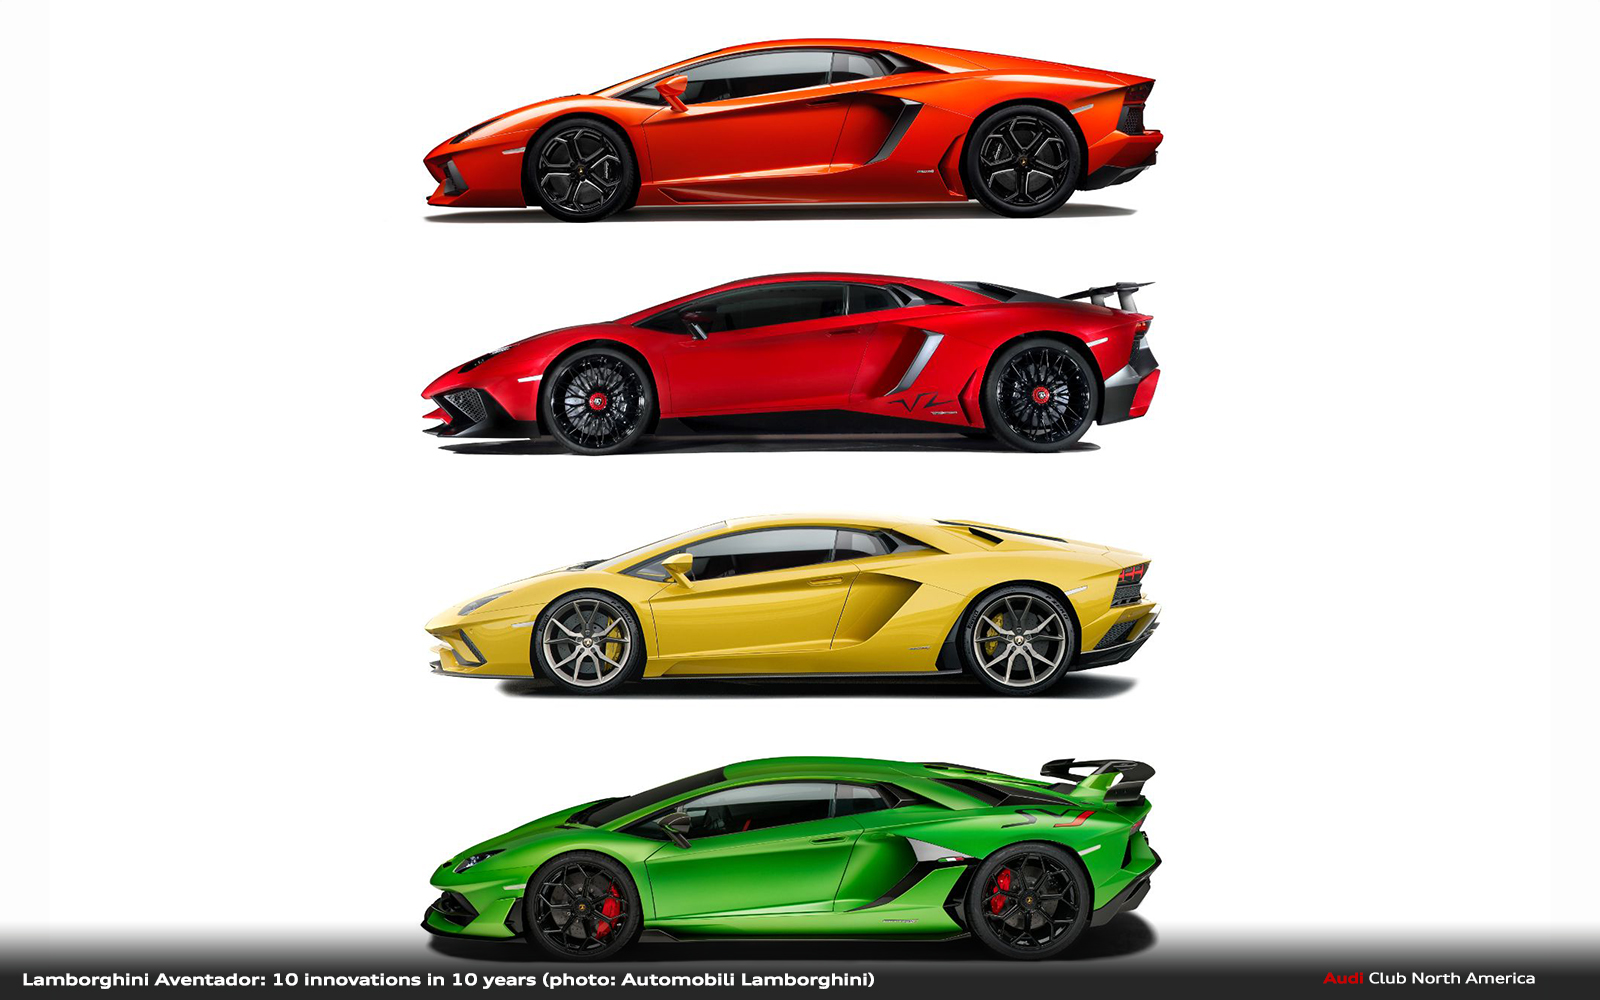 Lamborghini Aventador: 10 Innovations in 10 Years